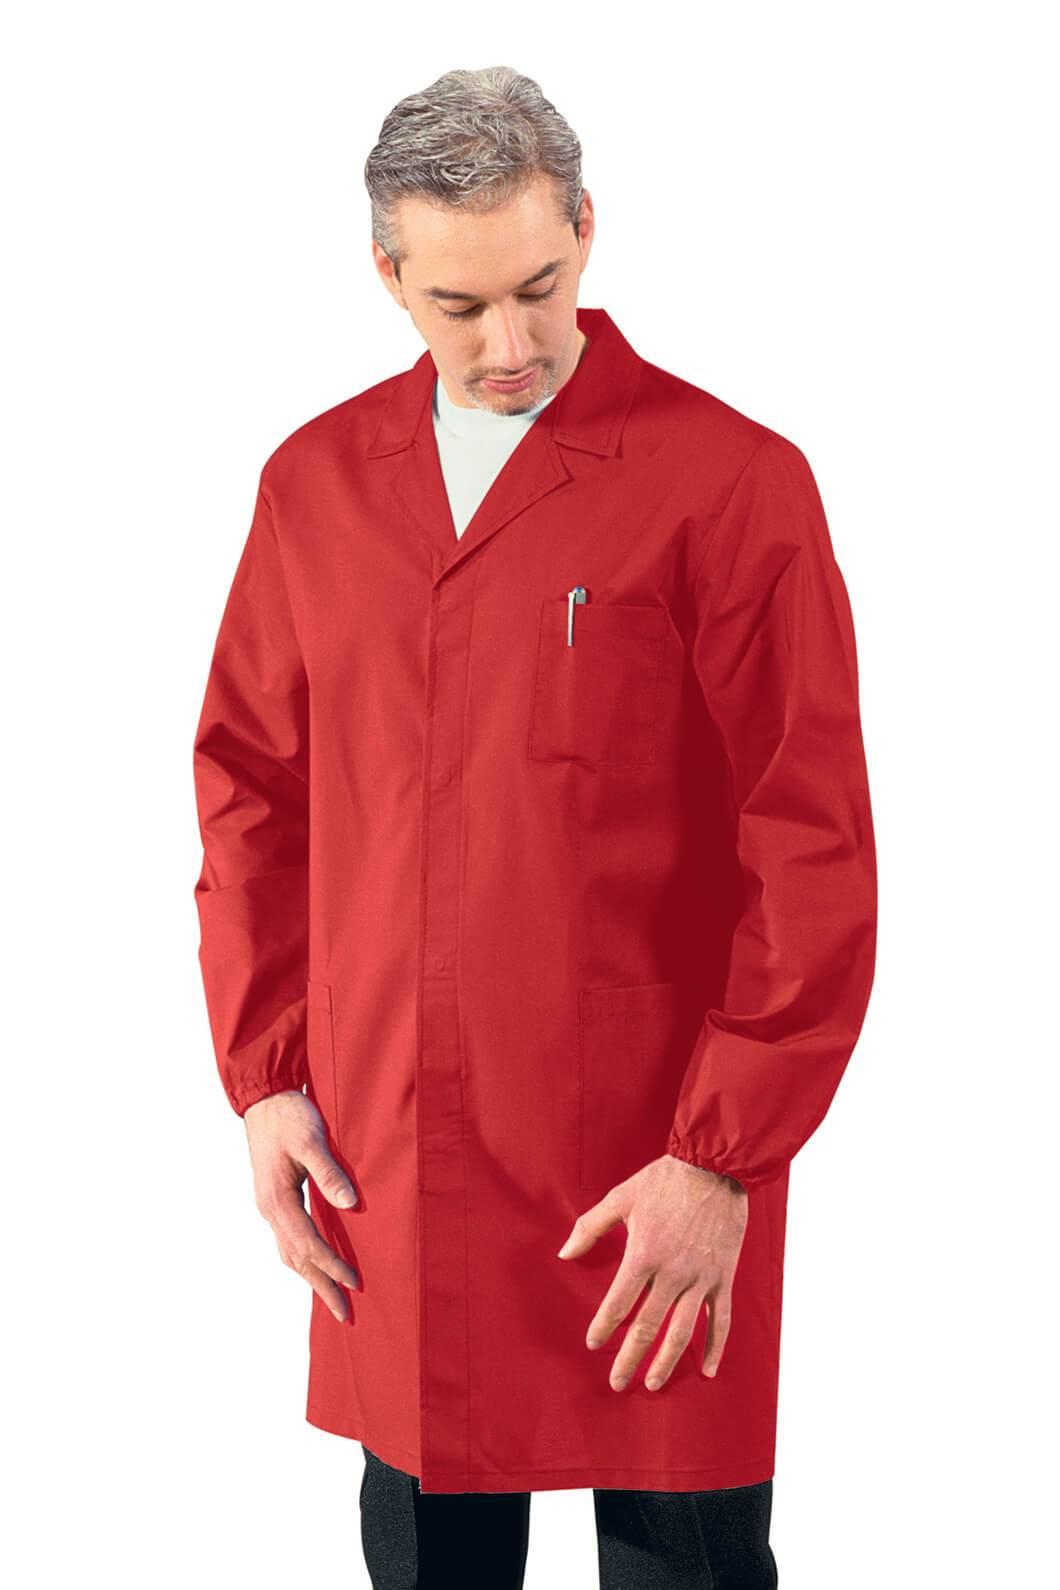 blouse m dicale homme manches longues rouge. Black Bedroom Furniture Sets. Home Design Ideas